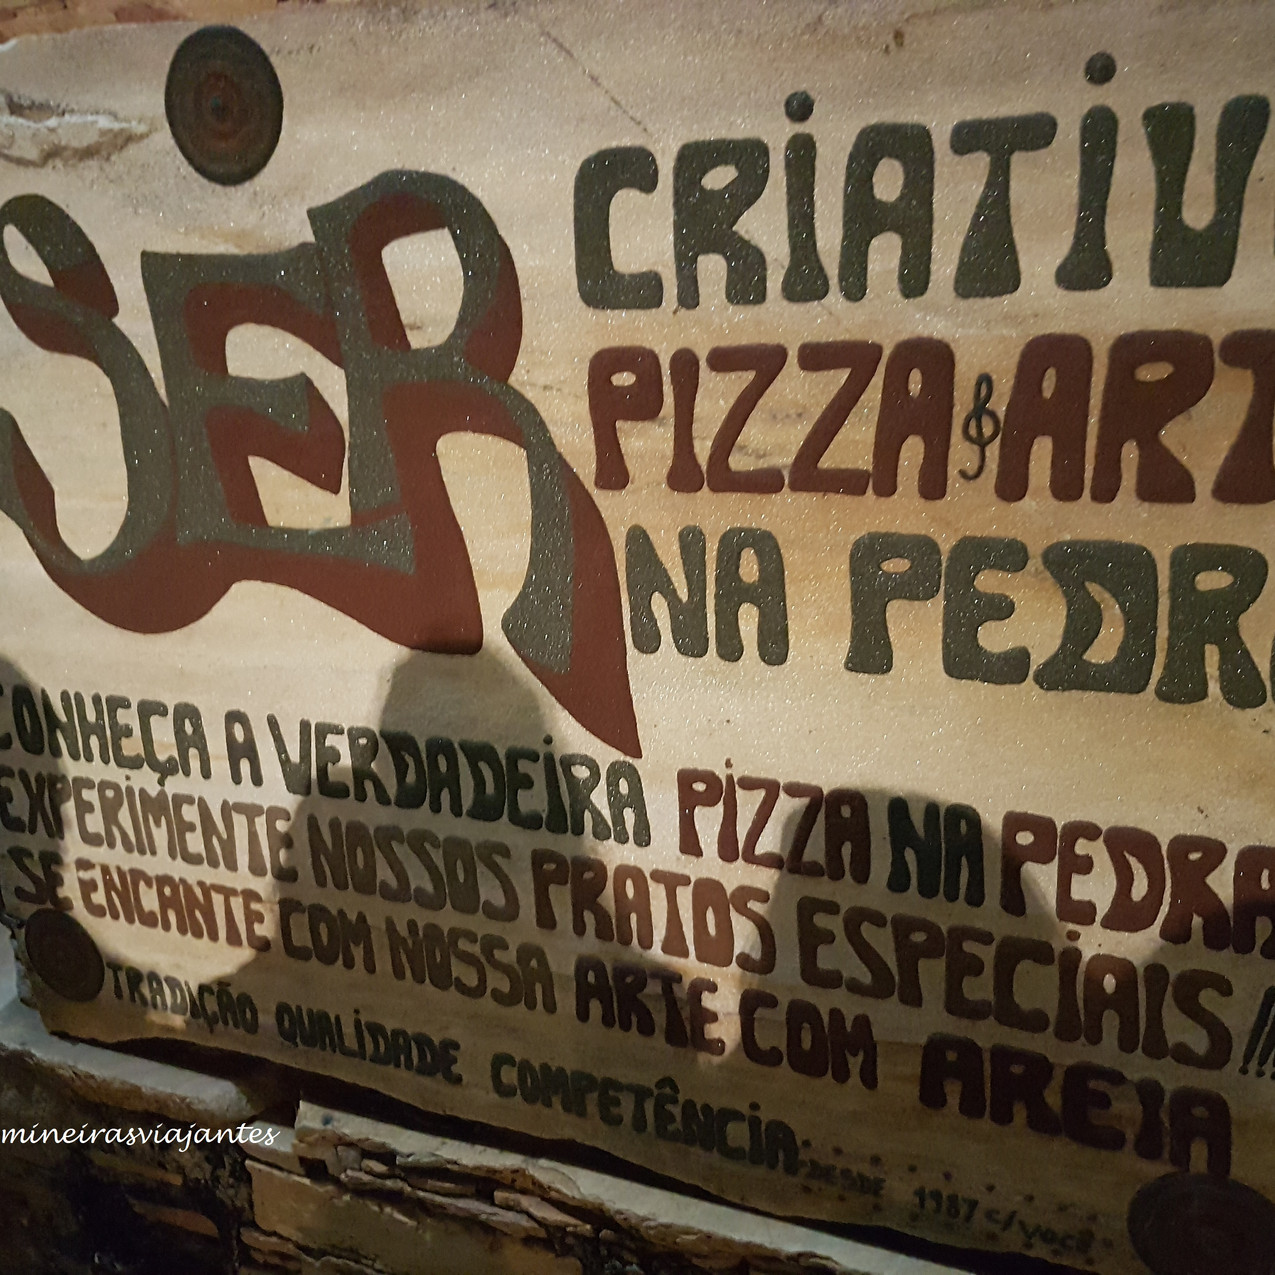 Pizzaria Ser Criativo